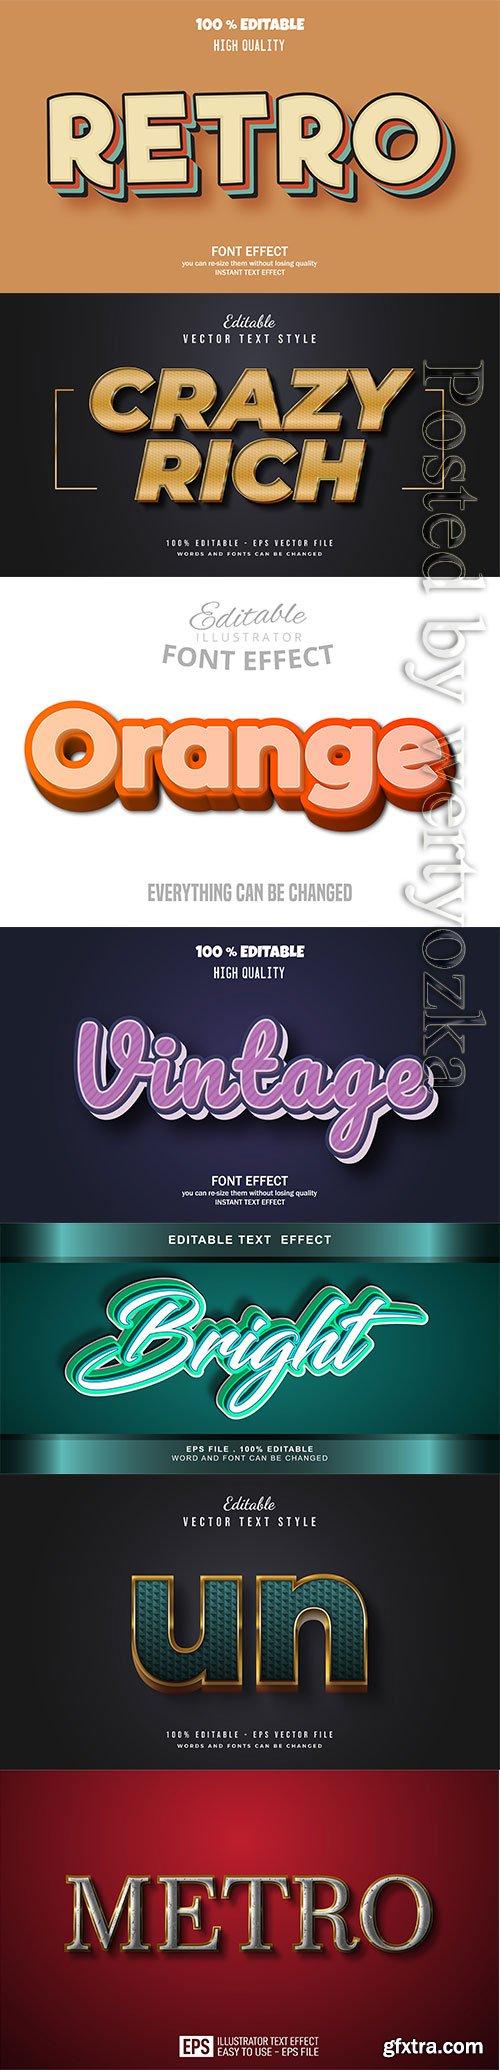 3d editable text style effect vector vol 262